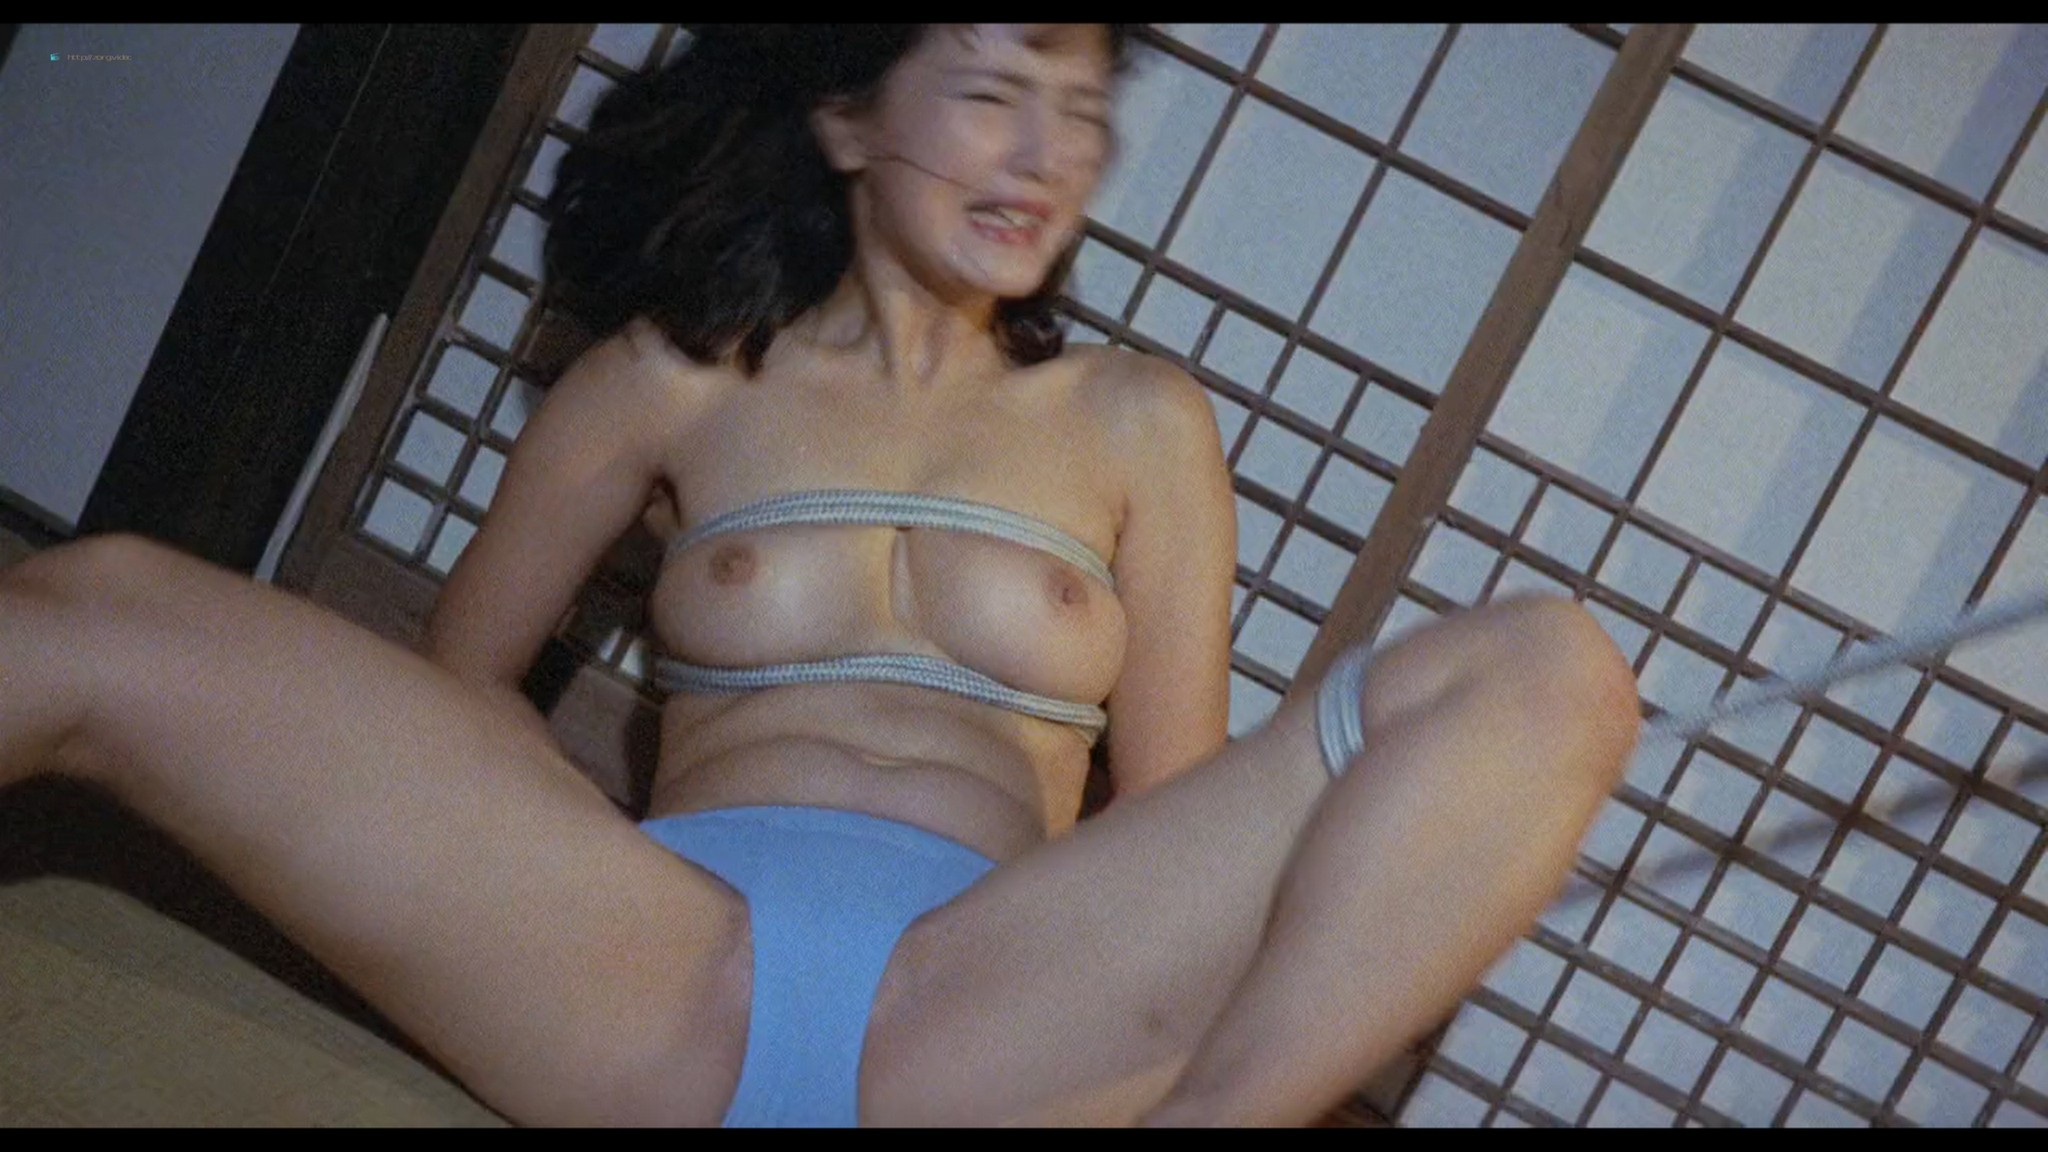 Jun Izumi nude hot sex - Angel Guts: Red Porno (JP-1981) HD 1080p BluRay (2)